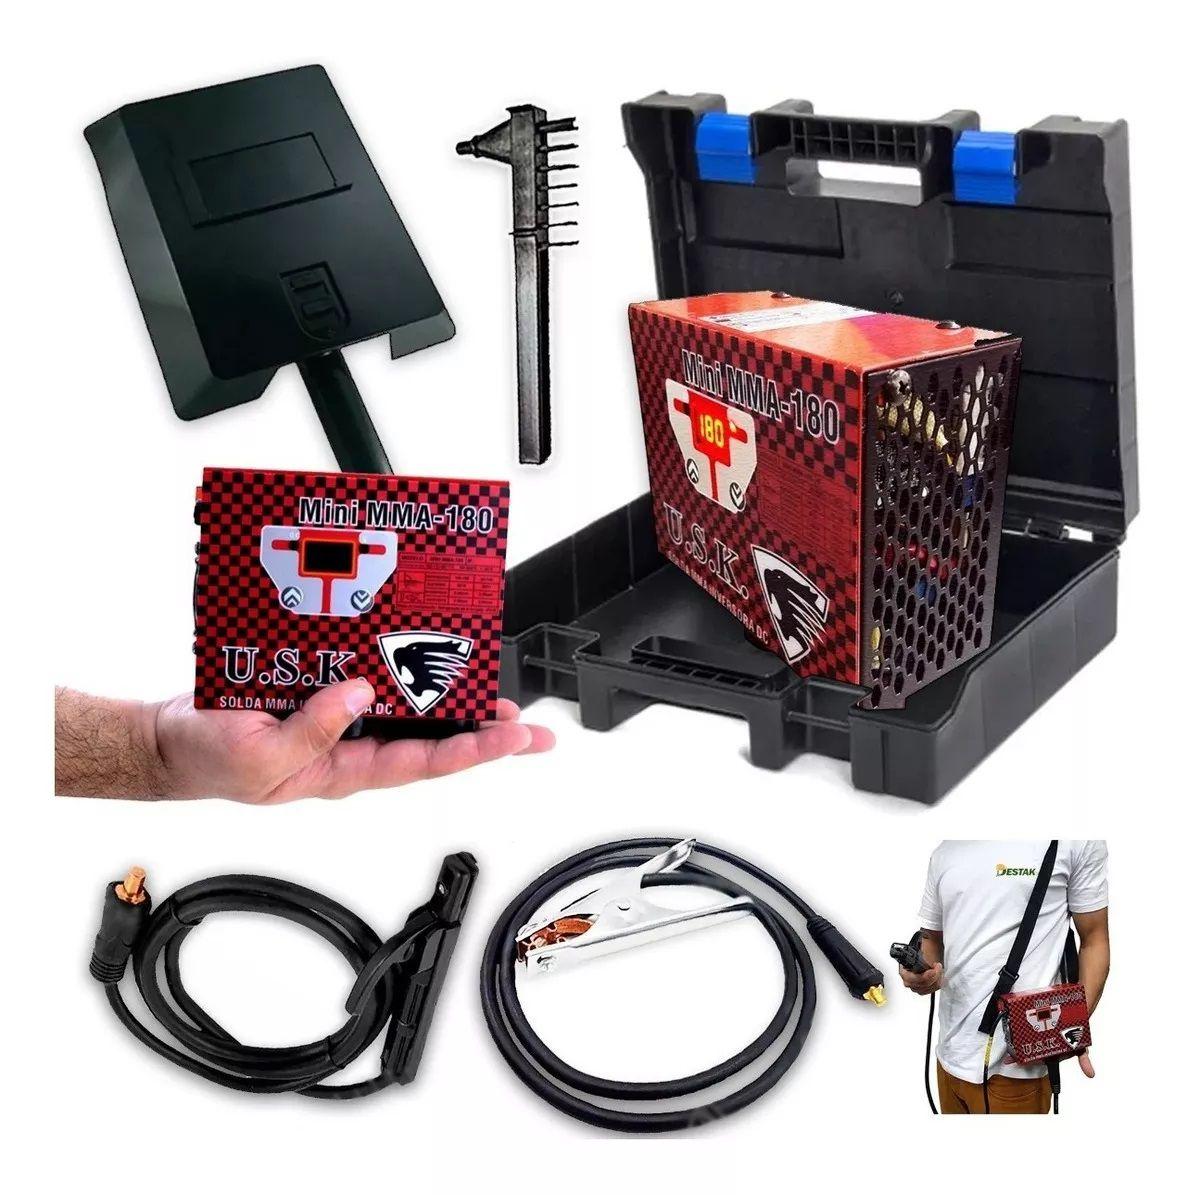 Mini Inversora Solda 180 Eletrodo Portatil + Maleta P/ Papai